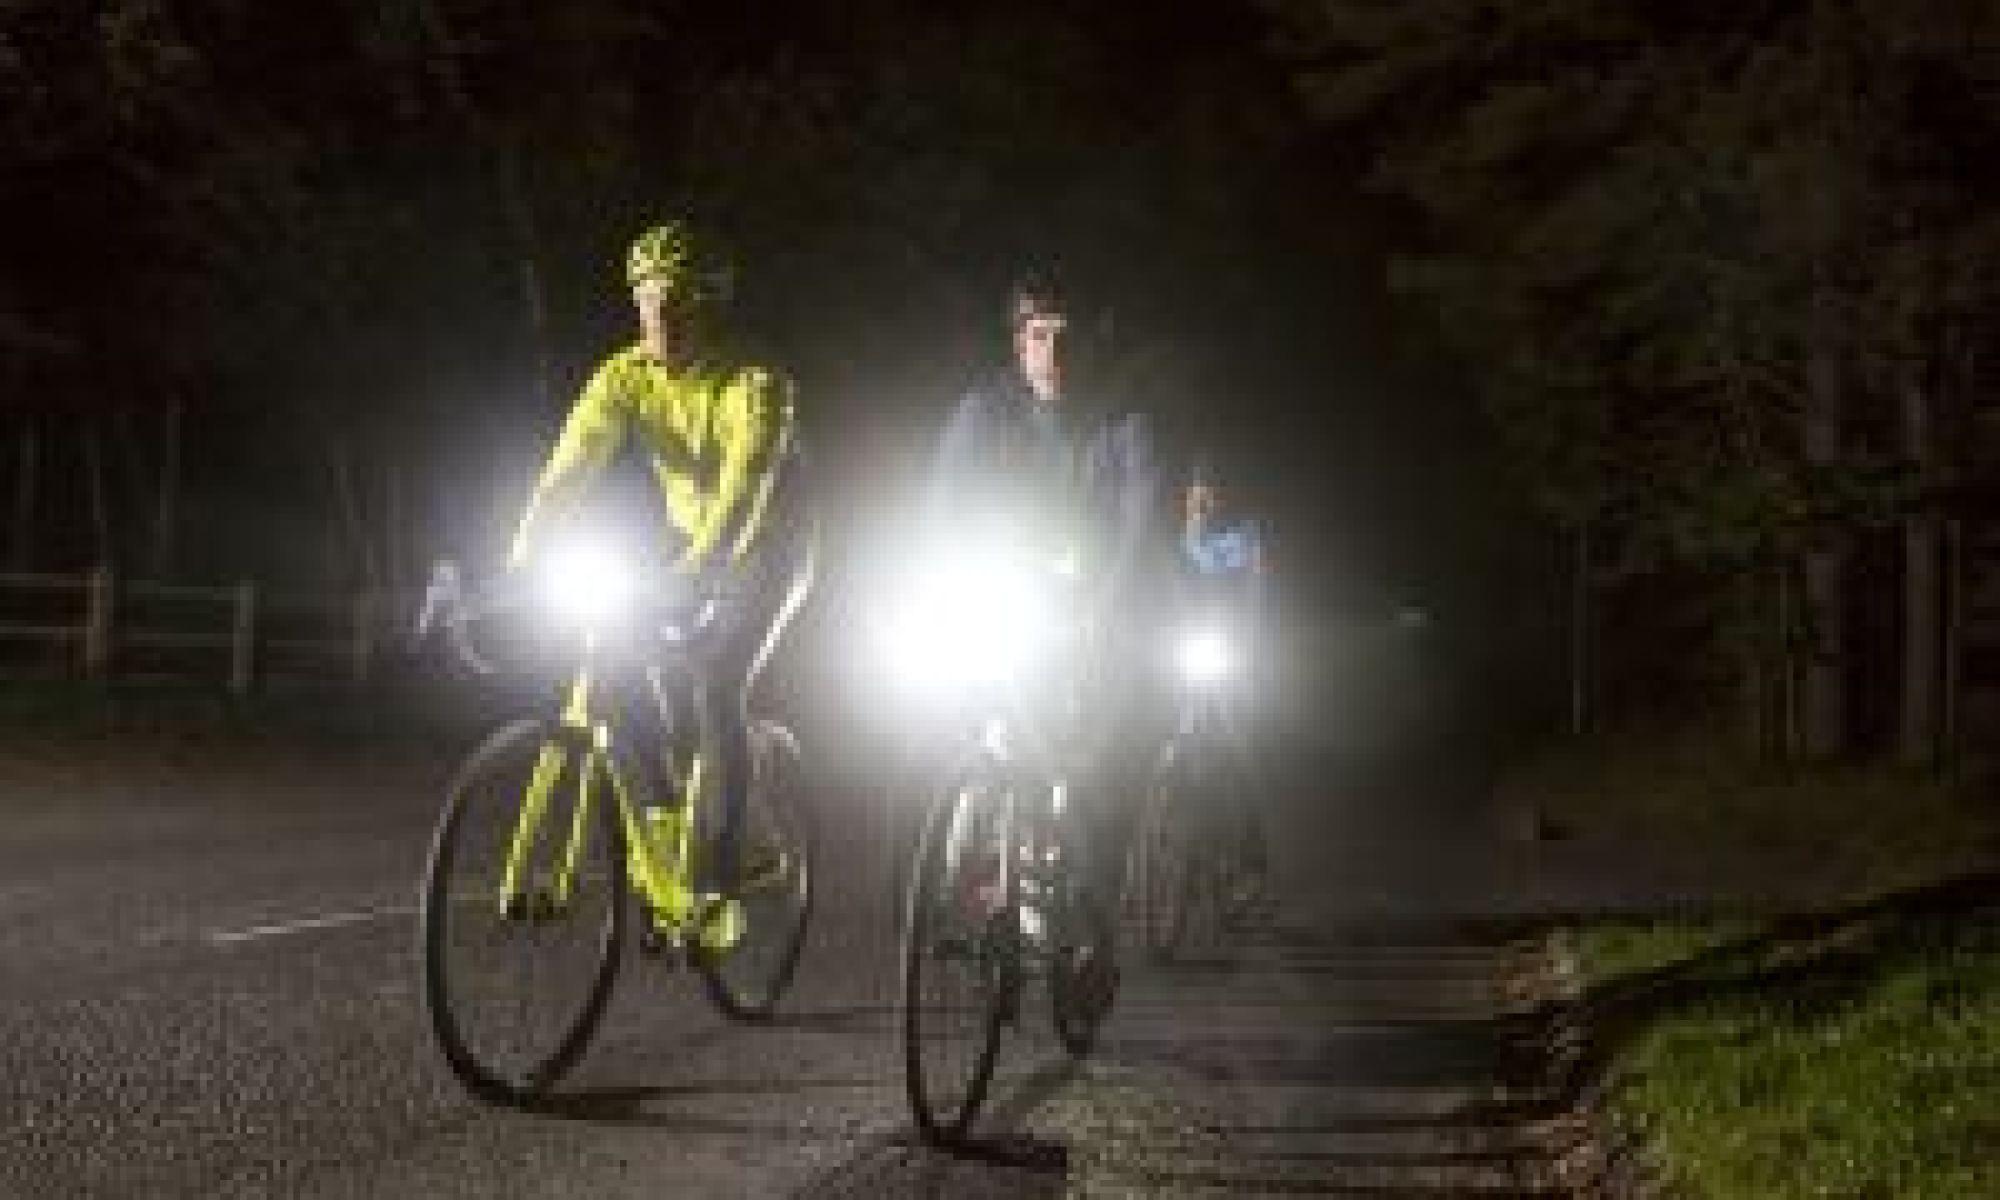 Best bike lights: best front and rear road bike lights 2020